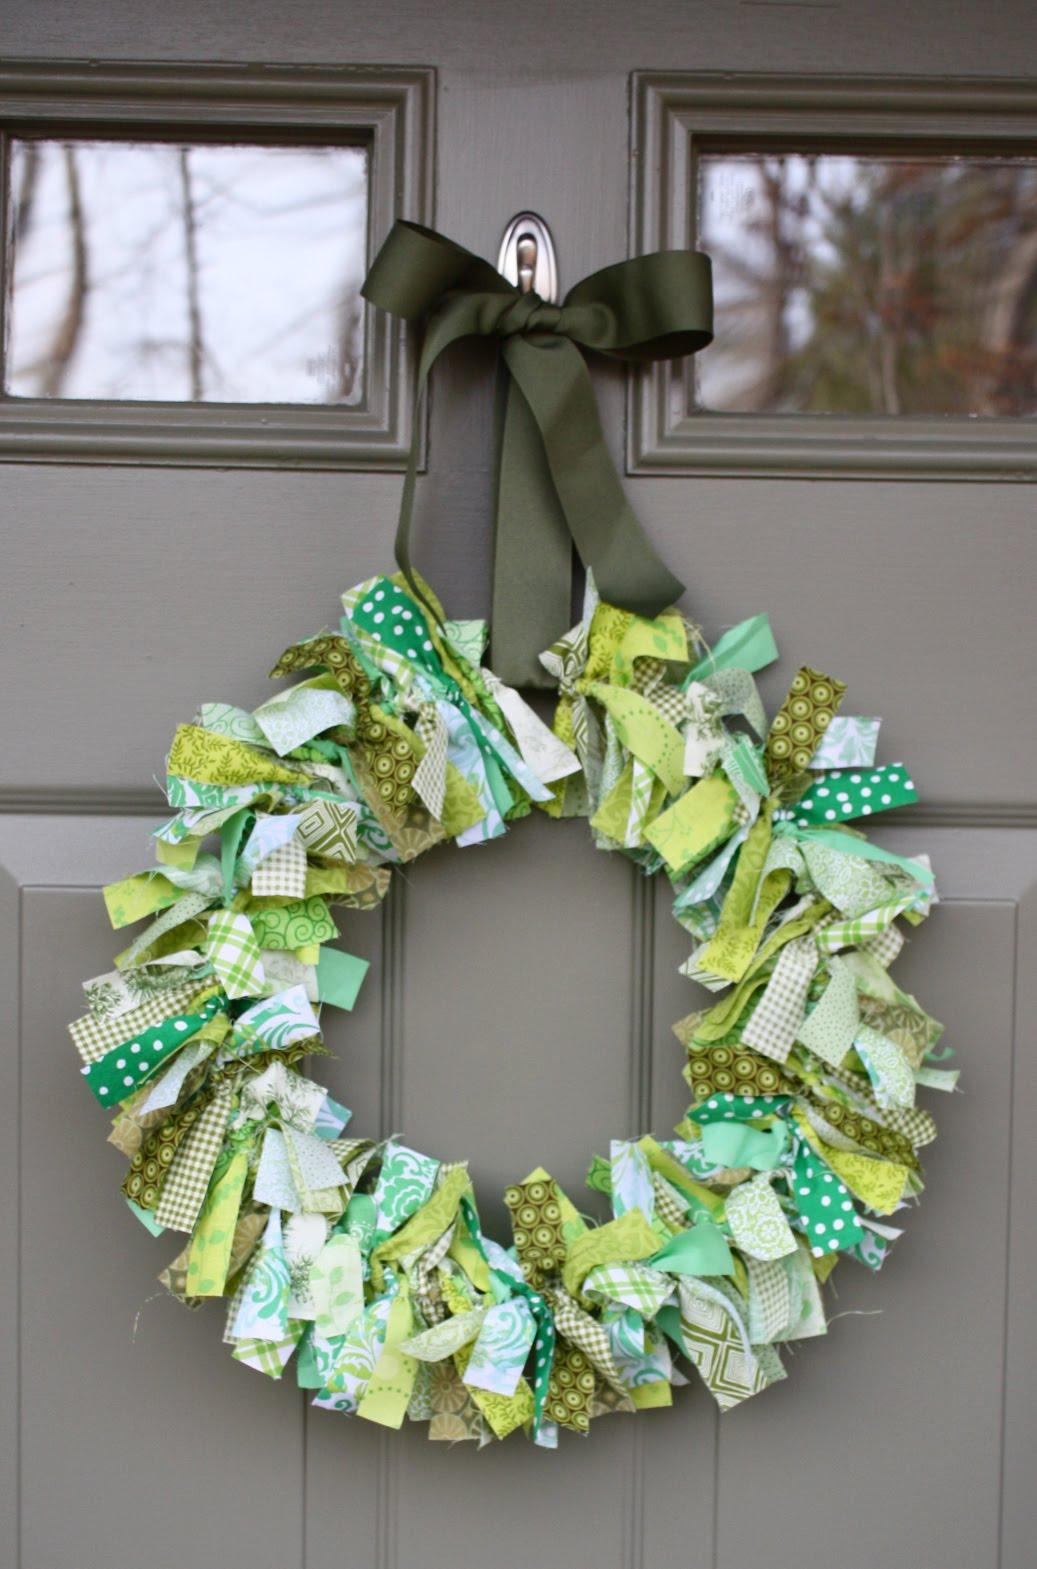 The Parish Piece: Fun Holiday Wreath!